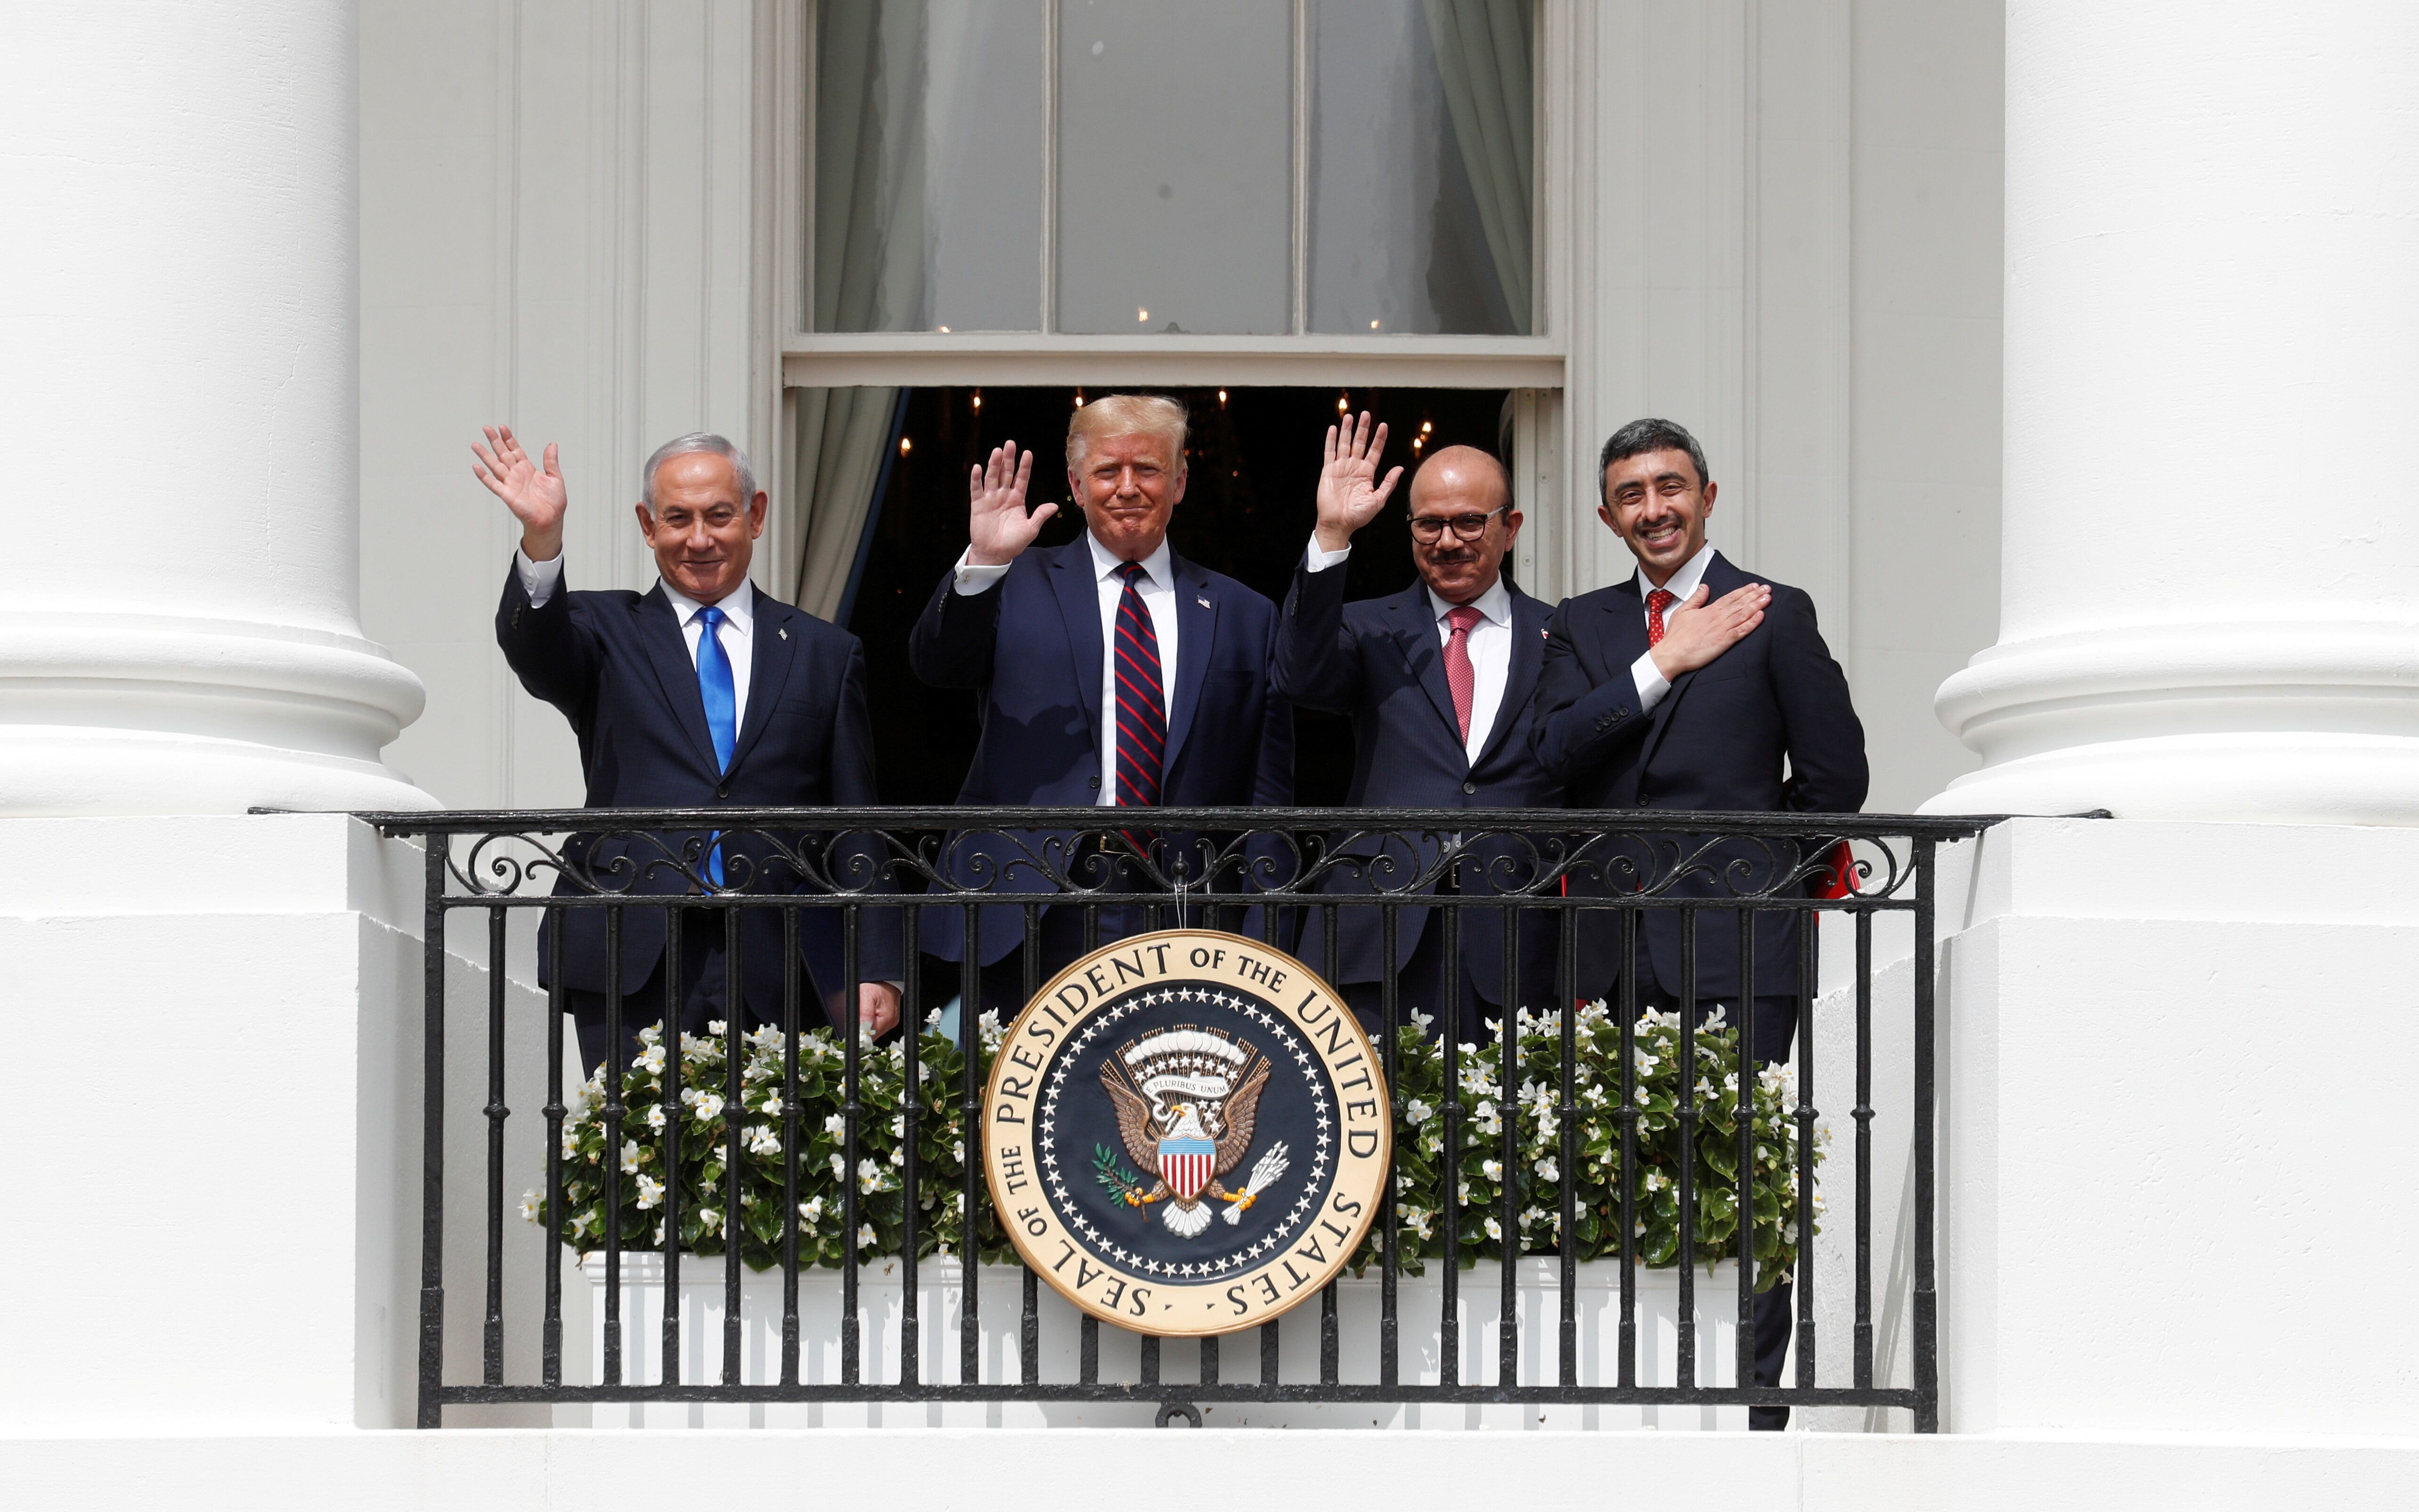 Israel's Prime Minister Benjamin Netanyahu, U.S. President Donald Trump, Bahrain's Foreign Minister Abdullatif Al Zayani and